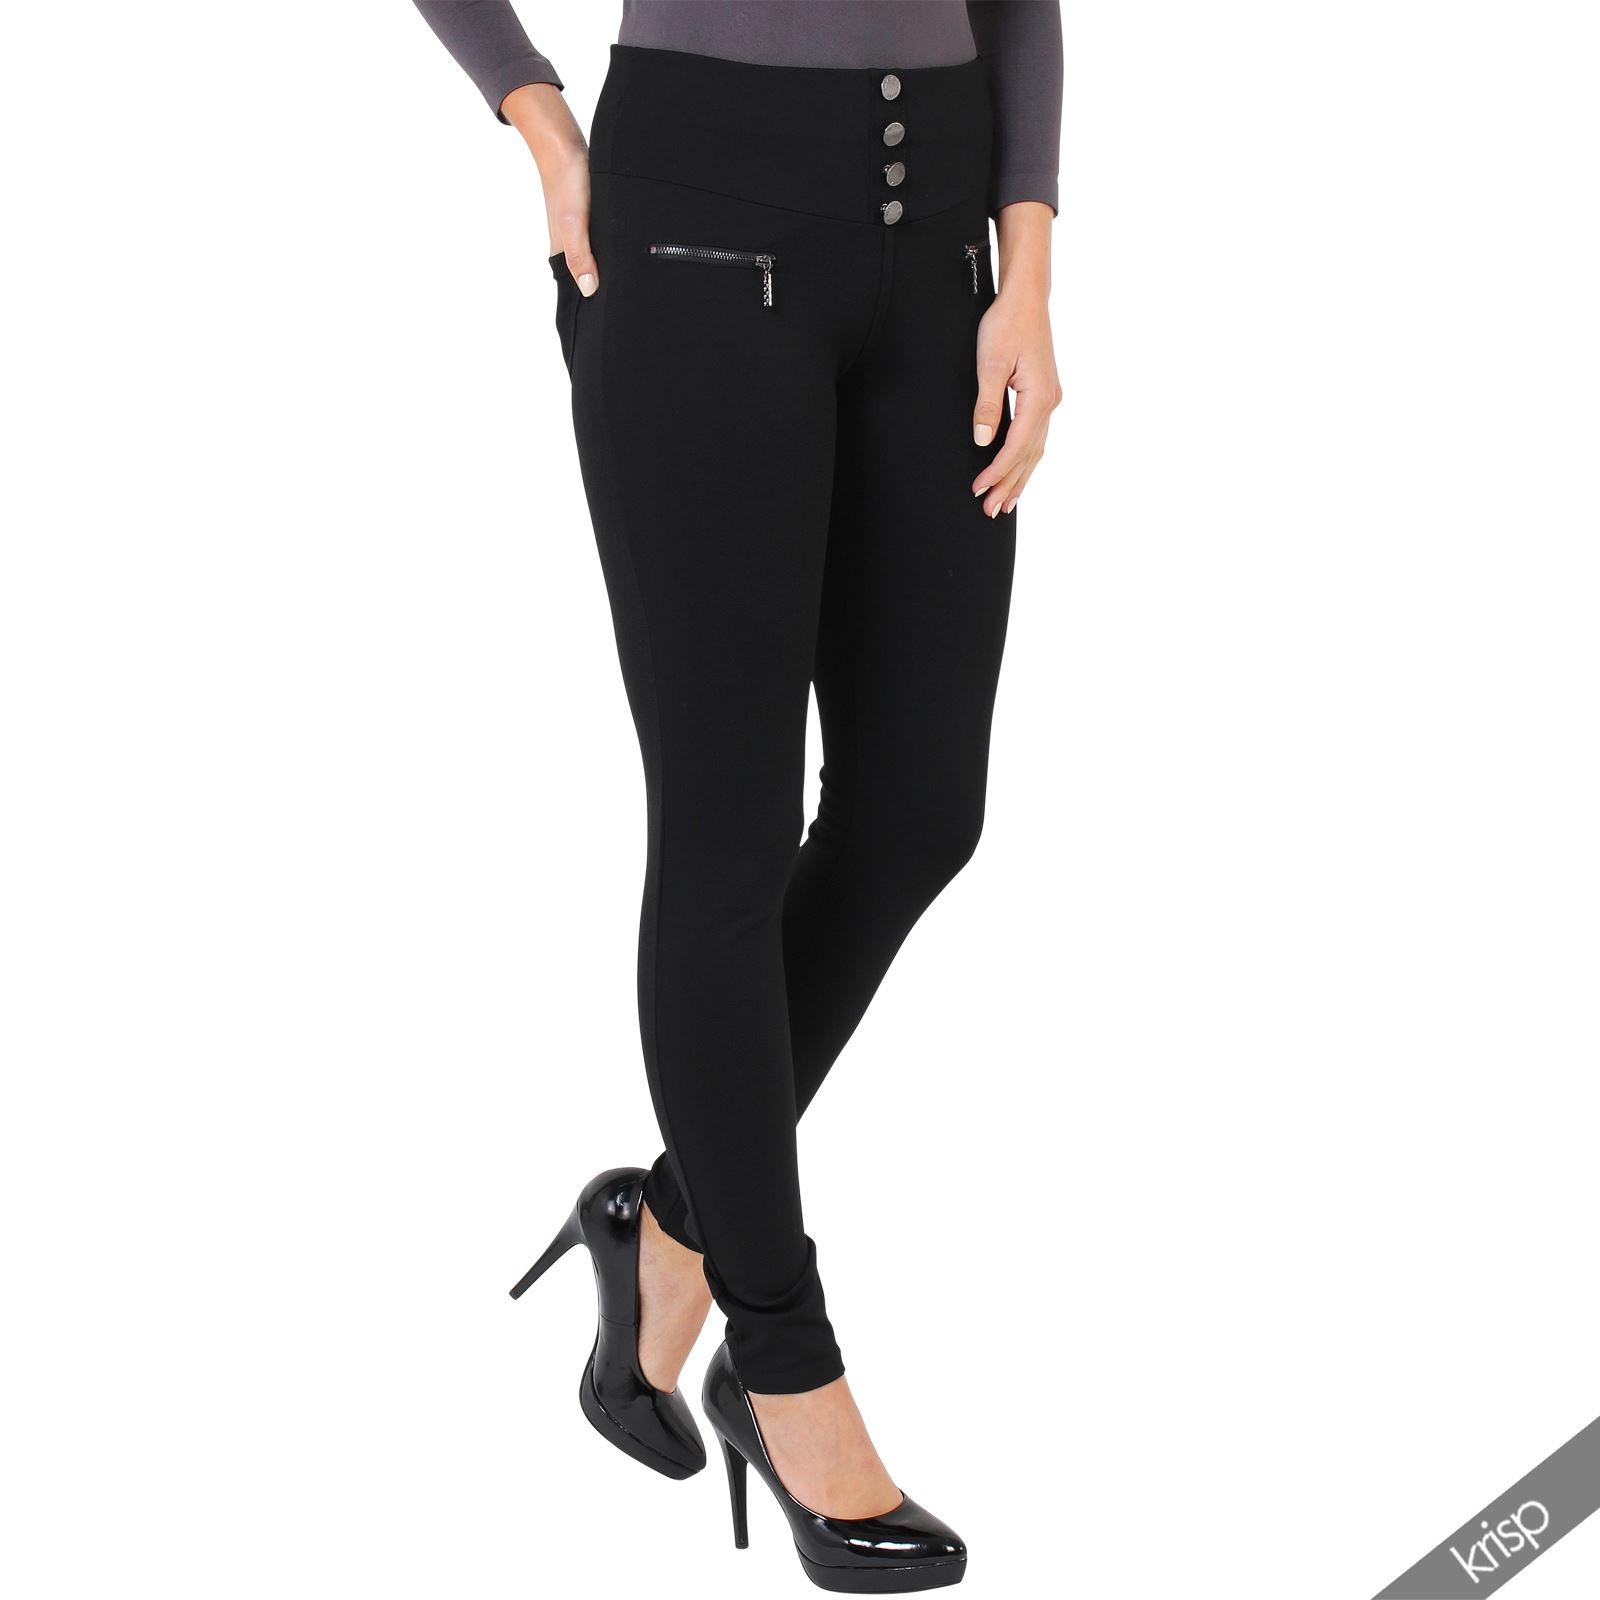 womens tailored high waist smart stretch jeggings leggings. Black Bedroom Furniture Sets. Home Design Ideas